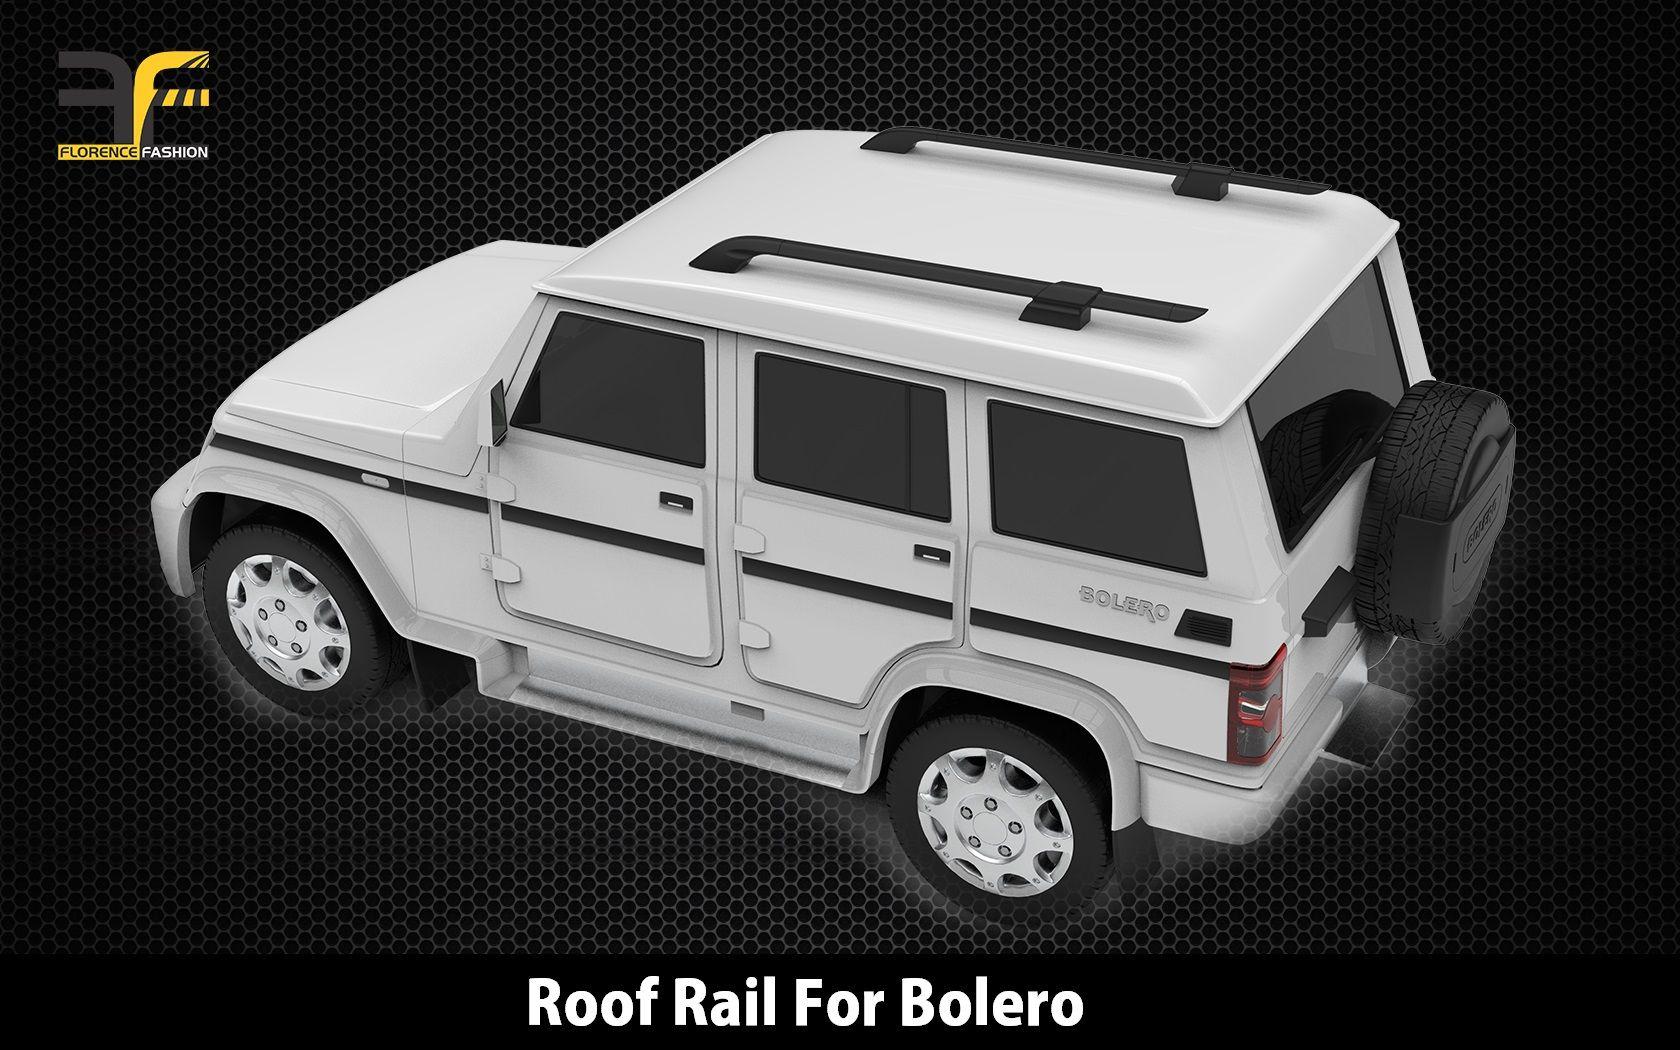 Roof Rail For Mahindra Bolero Car Accessories Roof Rails Car